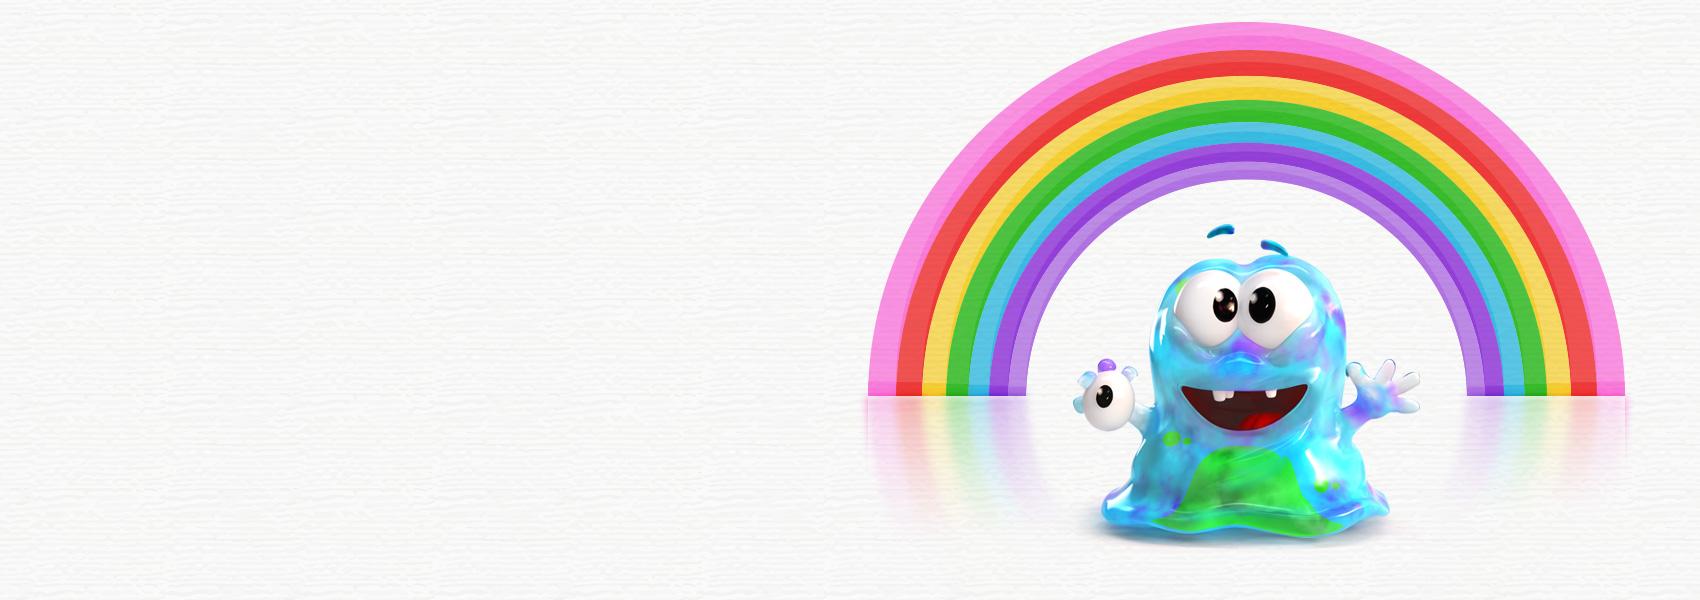 rainbow_1700x600